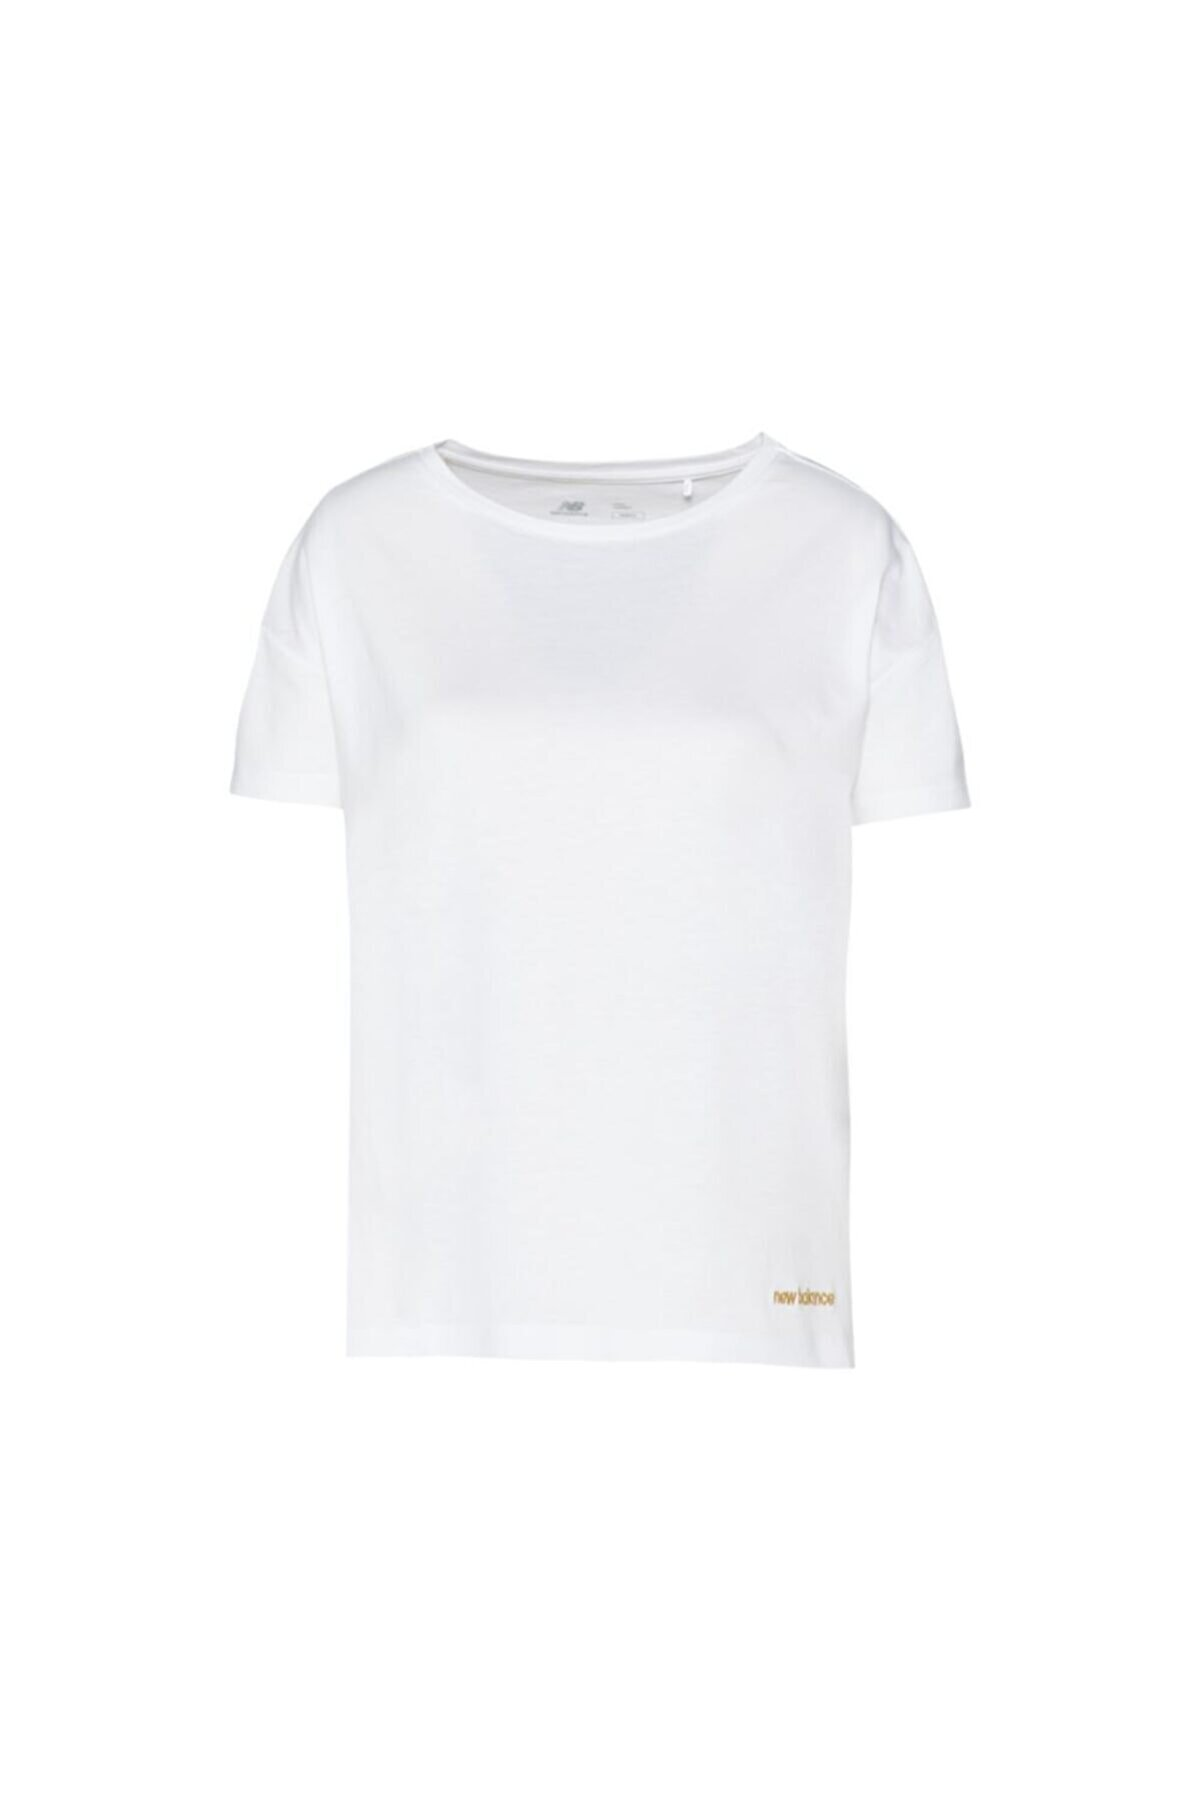 New Balance Kadın Beyaz Tişört Wnt3020-wt